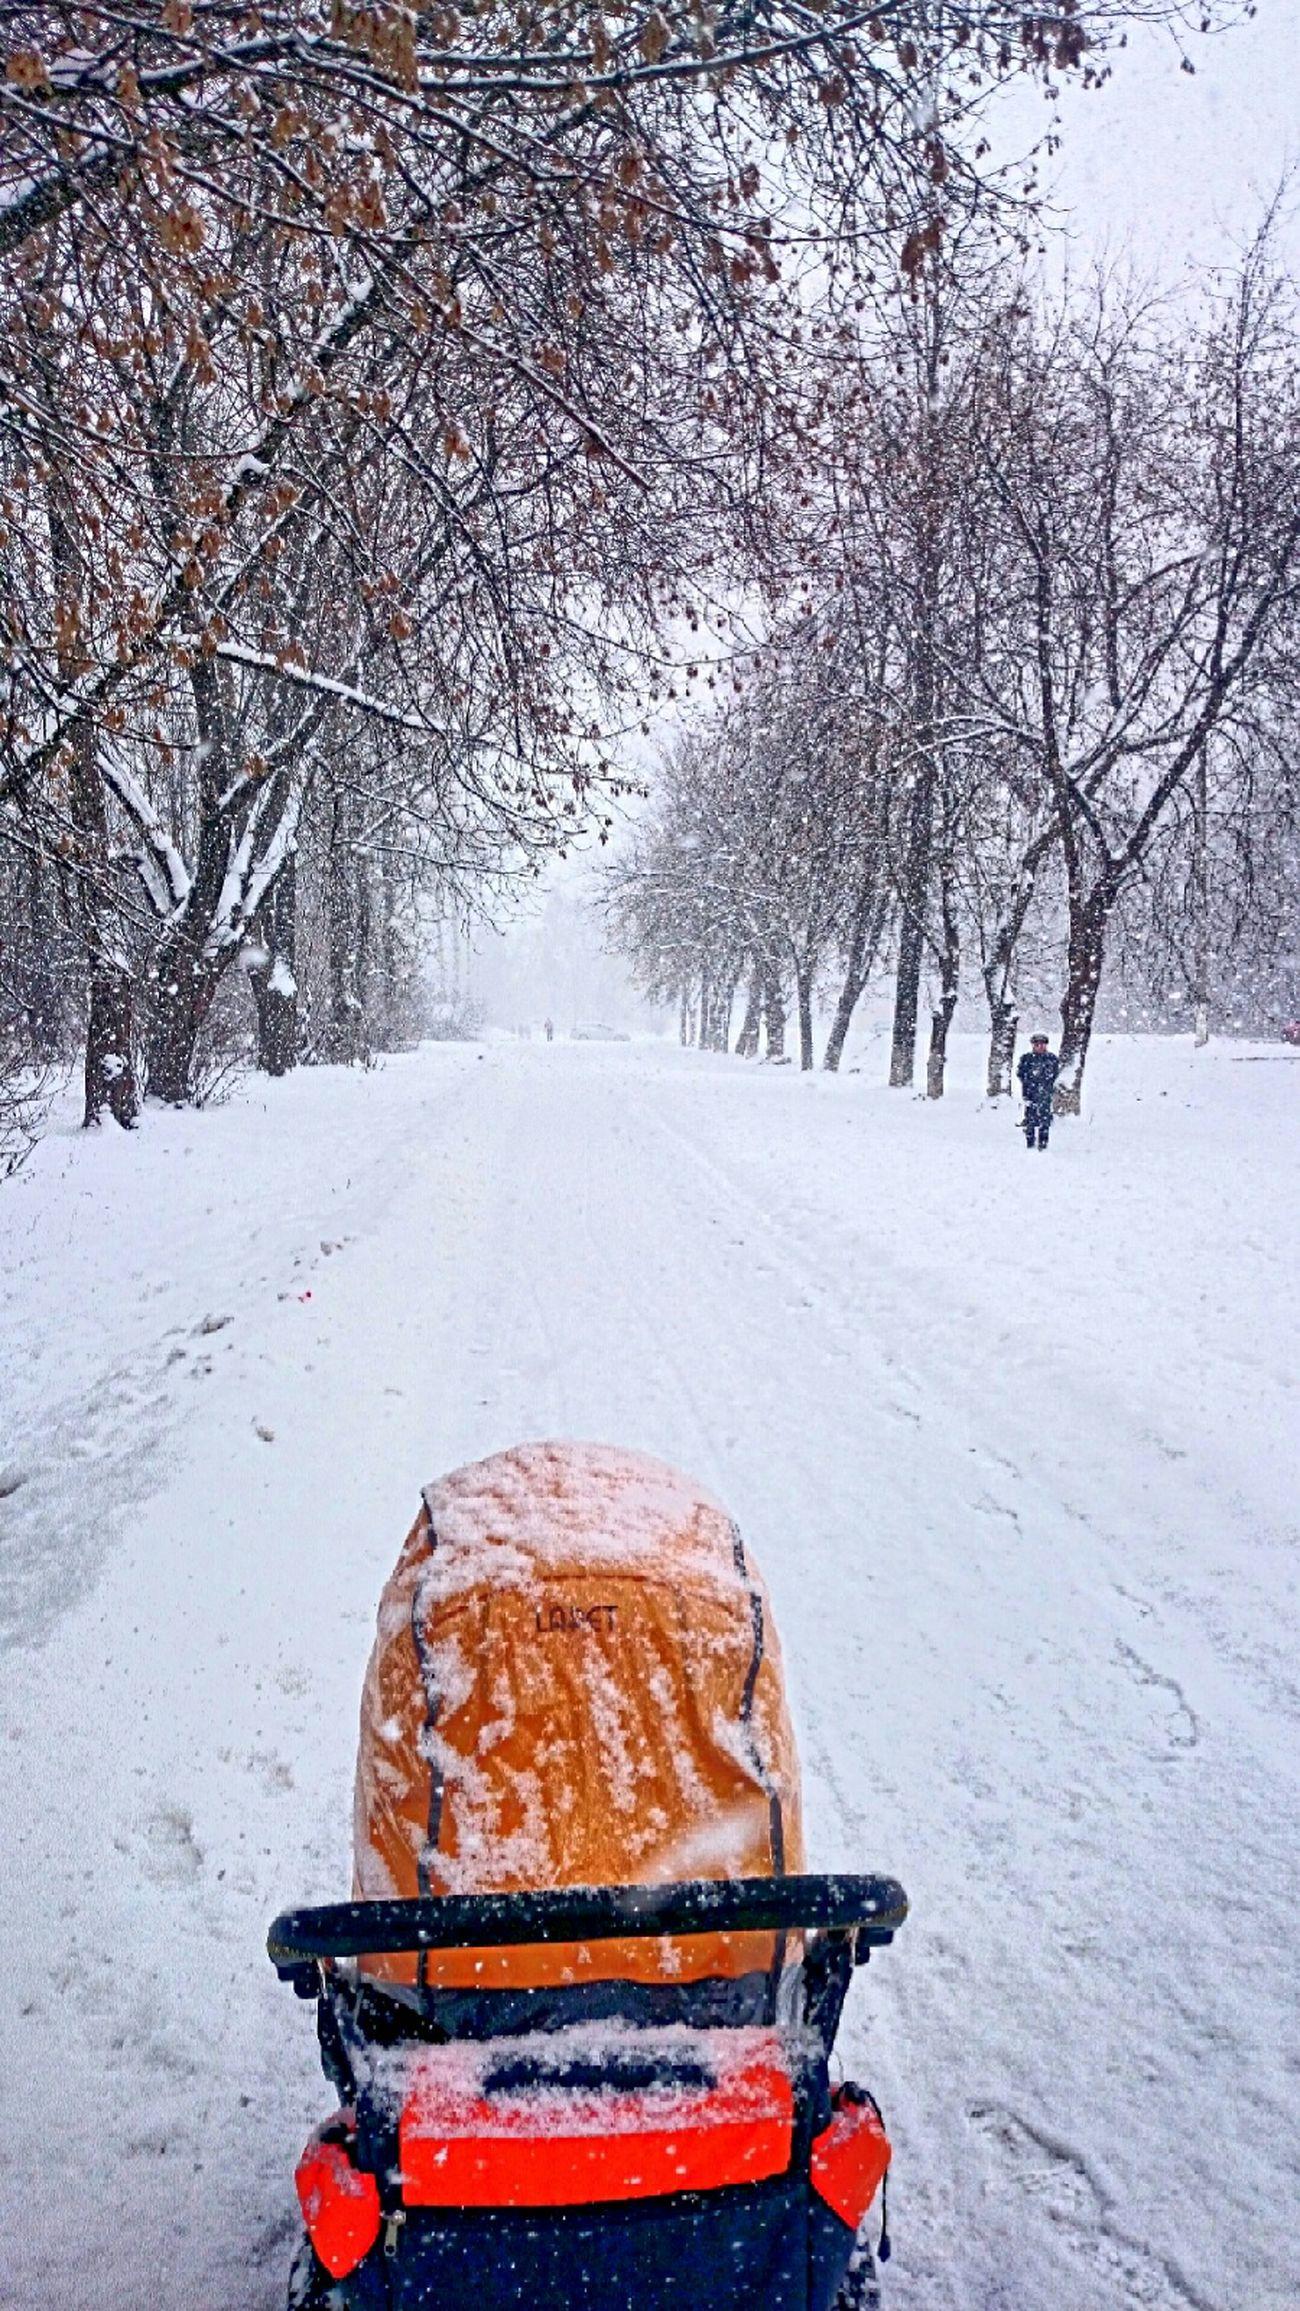 happy :) wintertime walk with my baby? Snow Day россияматушка чудесный зимний день❄⛄🌞